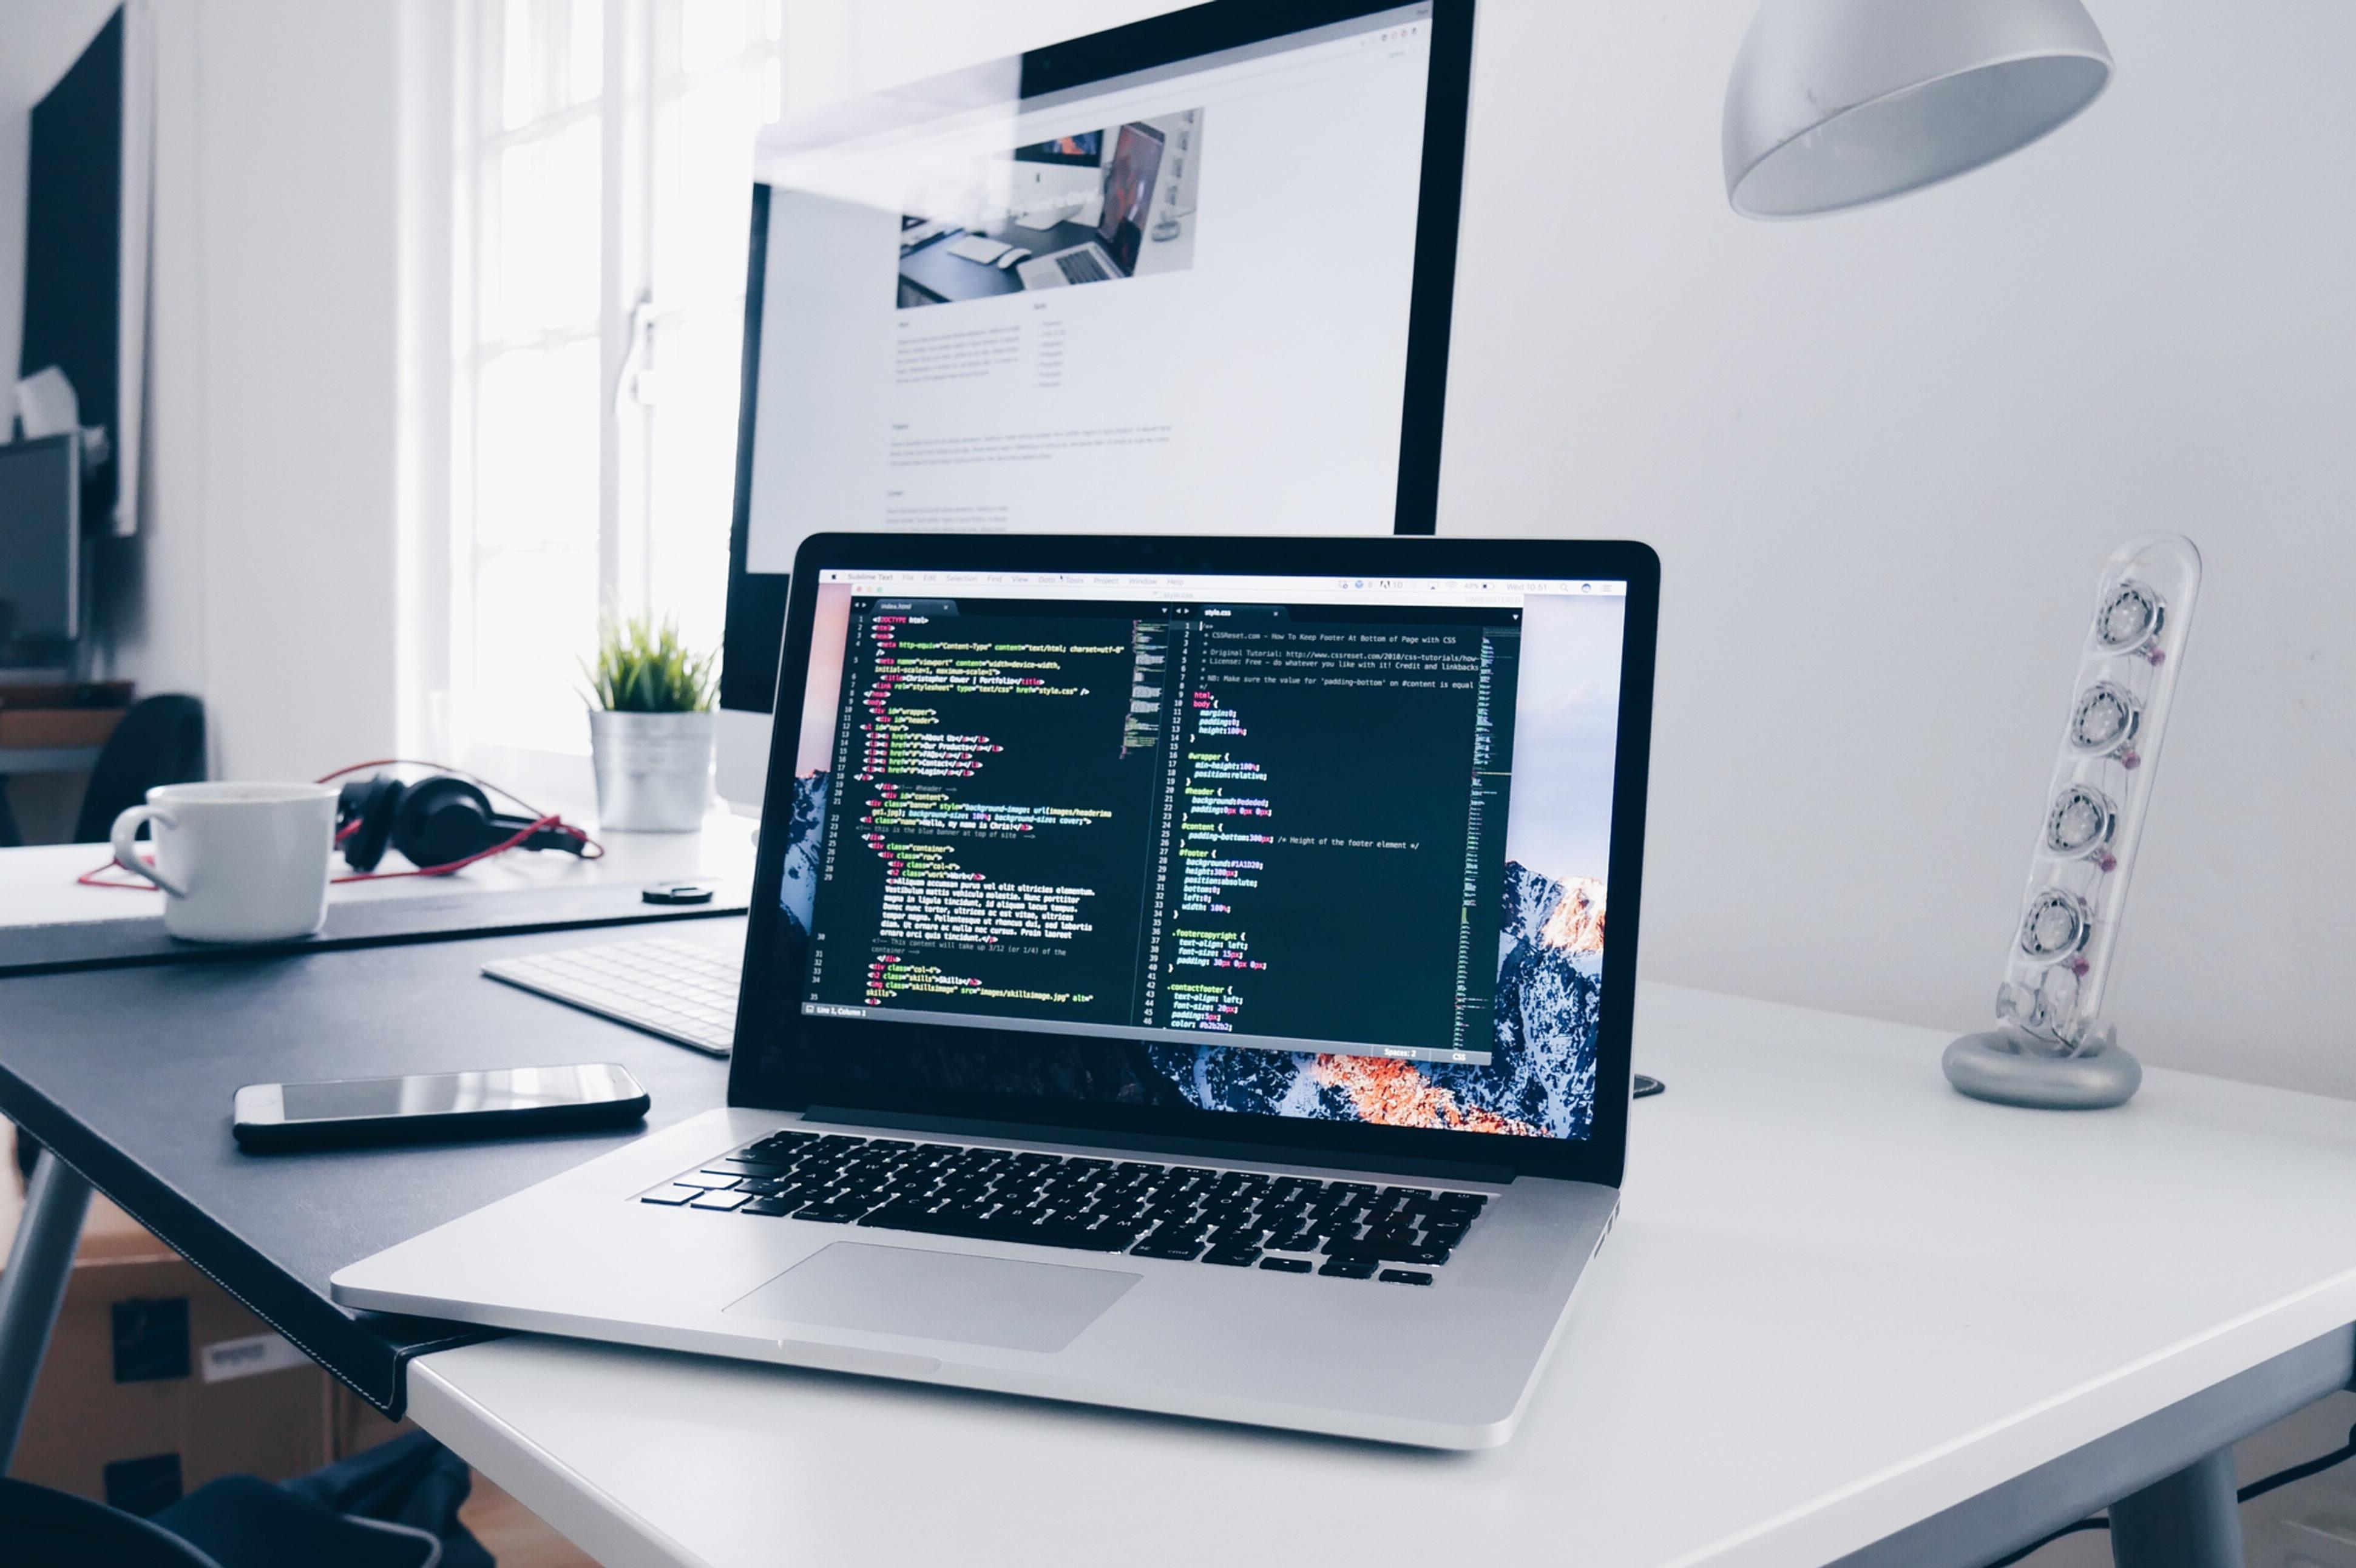 PC/MAC optimization